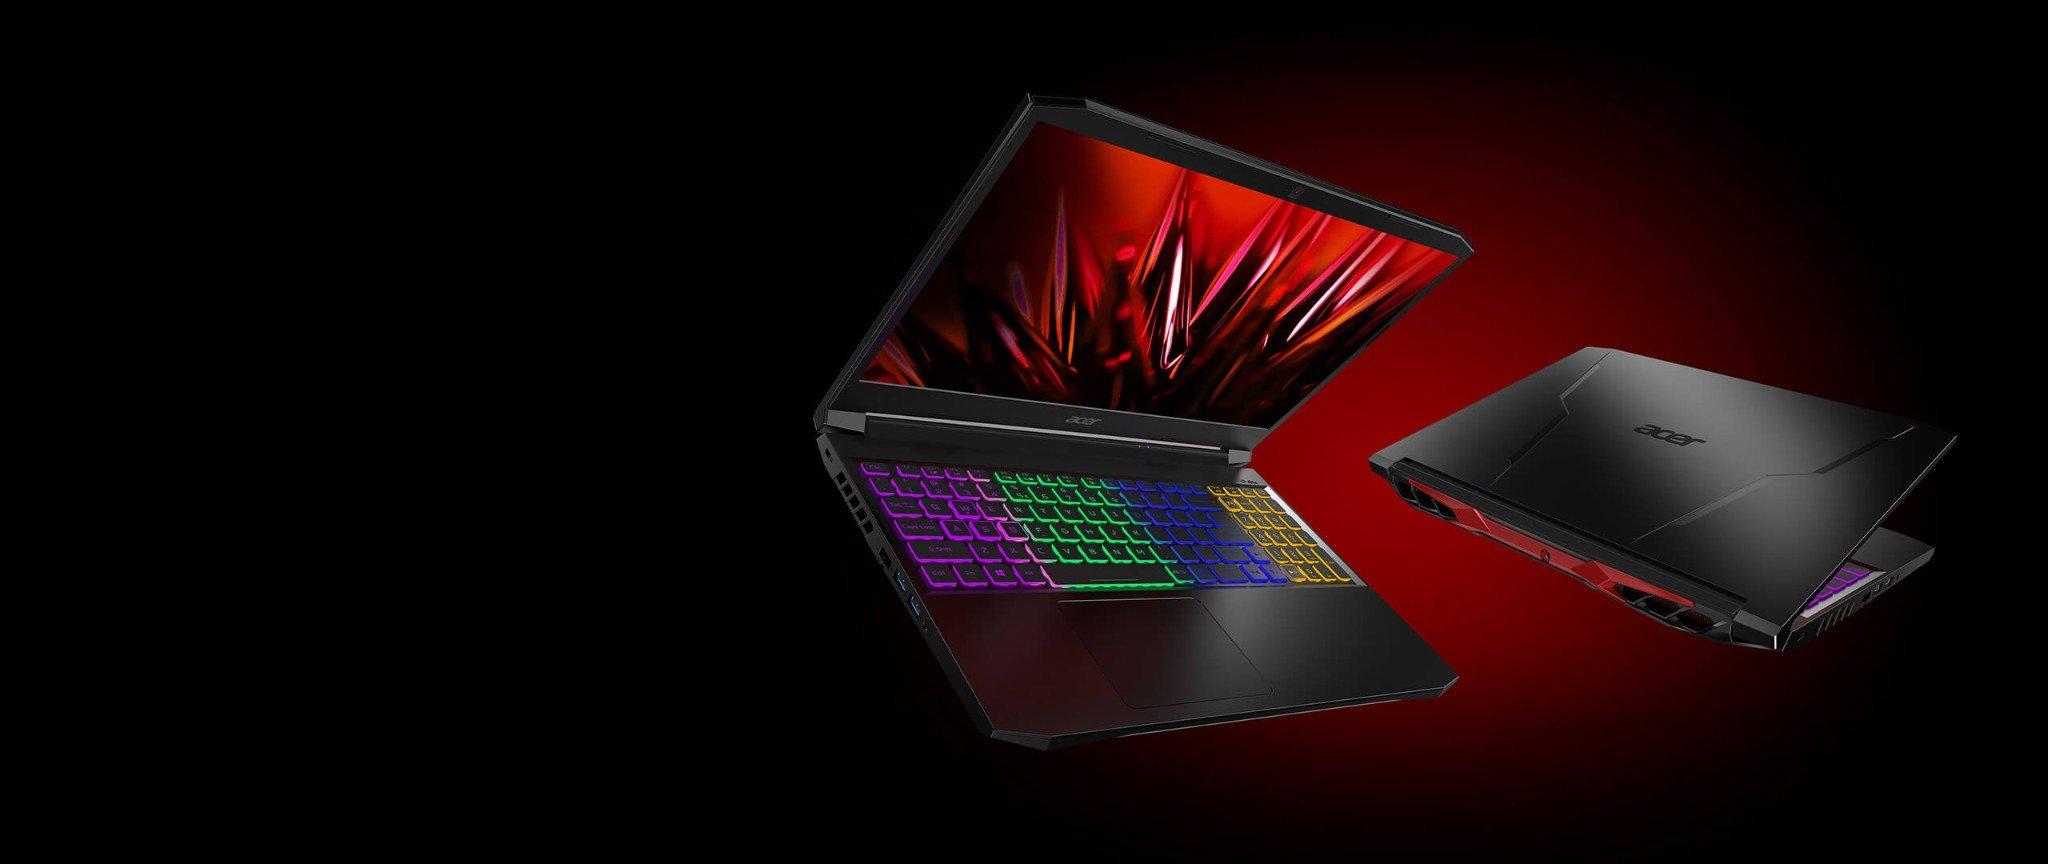 Acer Nitro 5: Xứng danh laptop gaming ngon-bổ-rẻ - GEARVN.COM